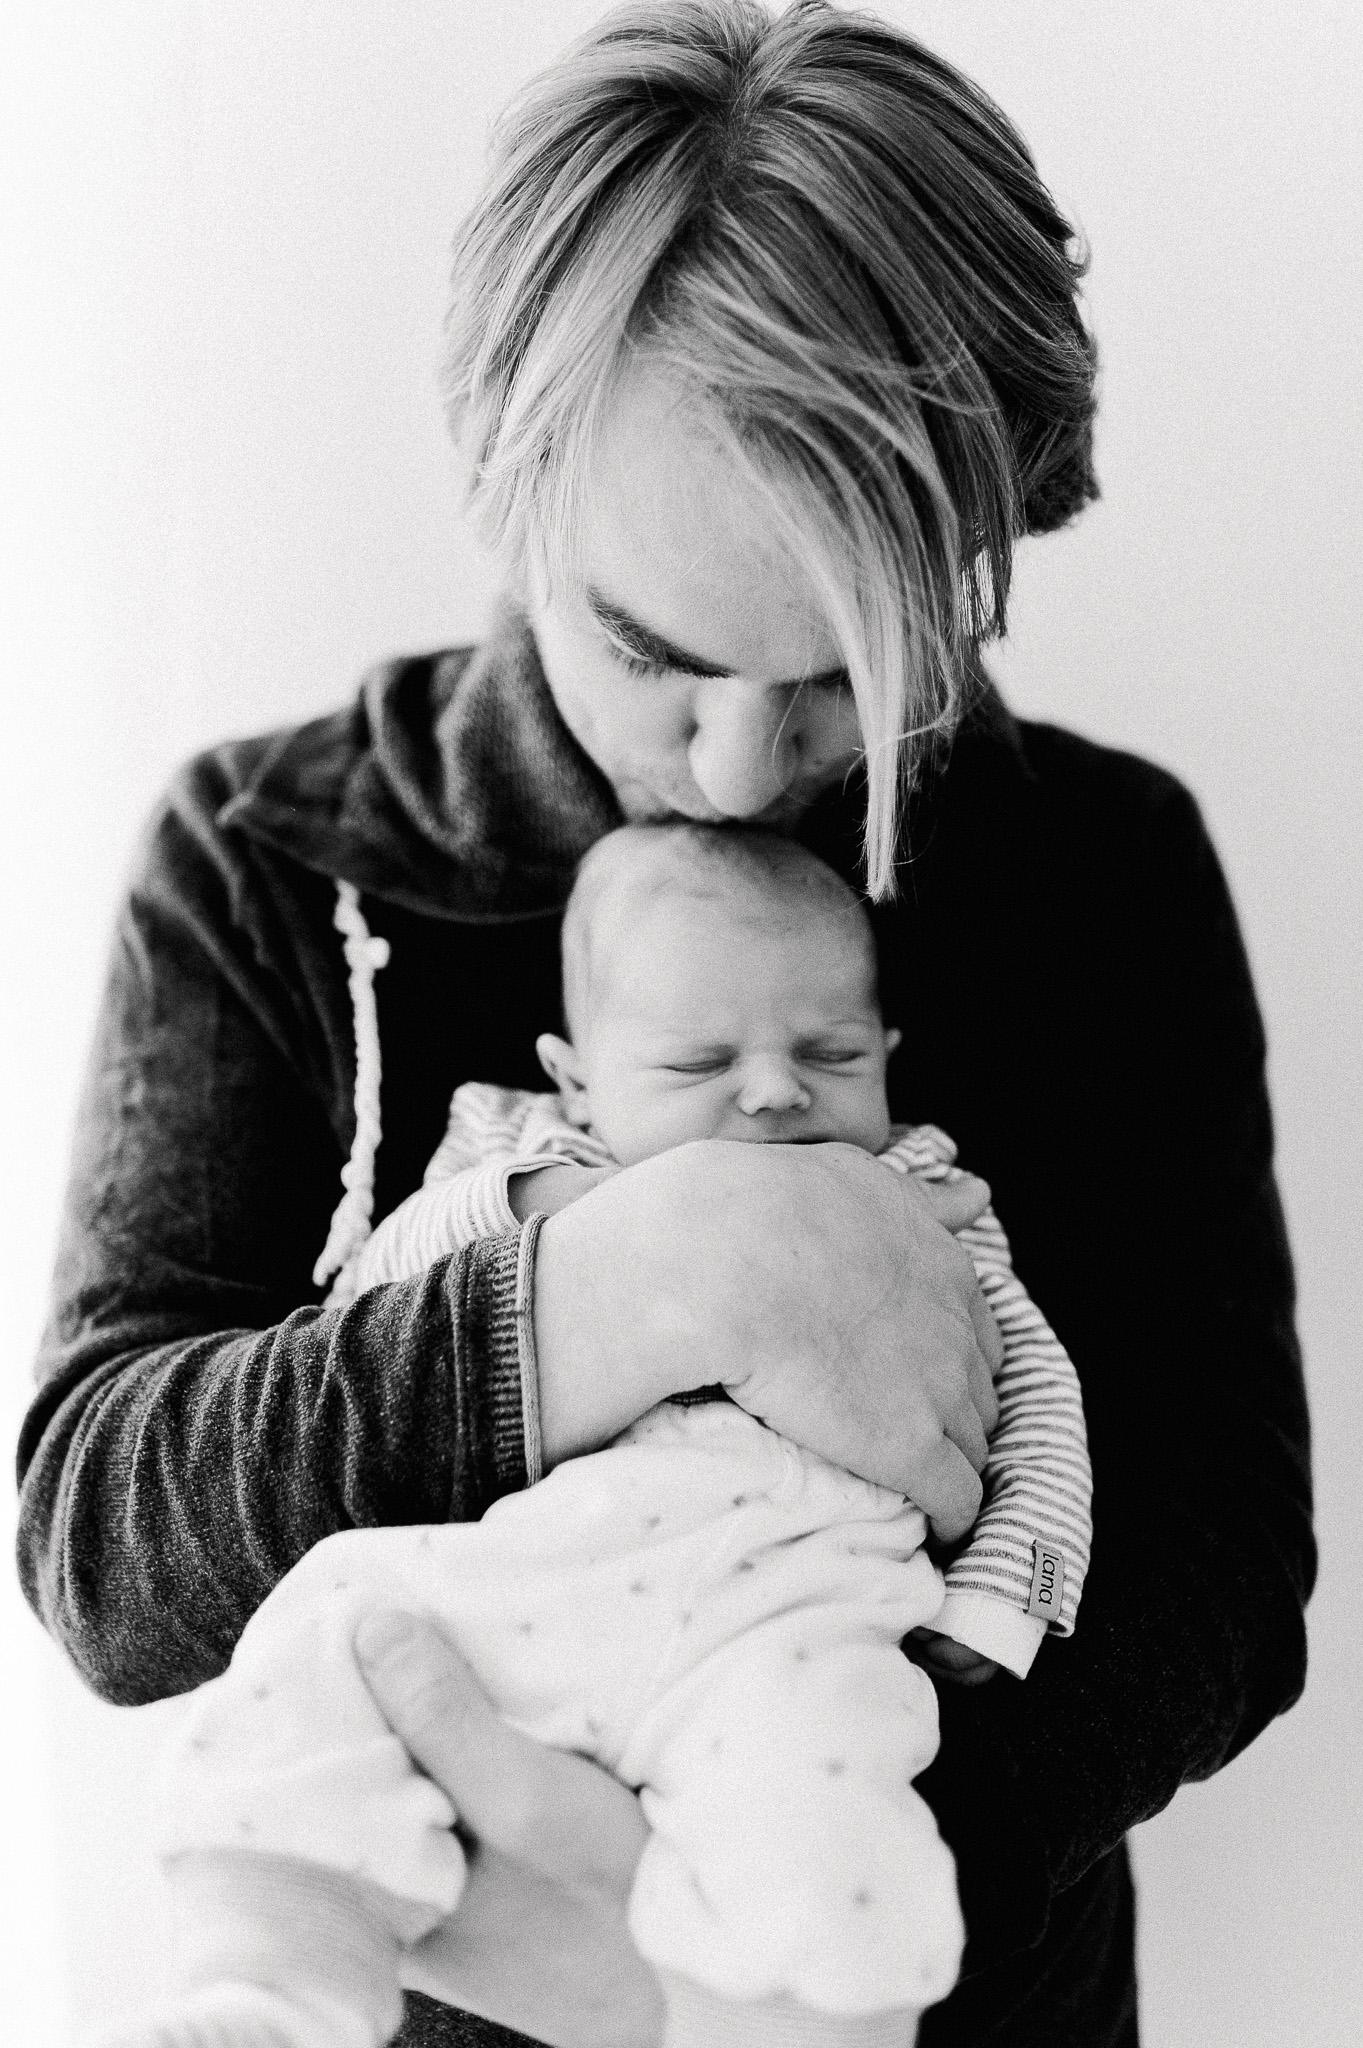 Anna-Hari-Photography-Familienshooting-Mannheim-49.jpg